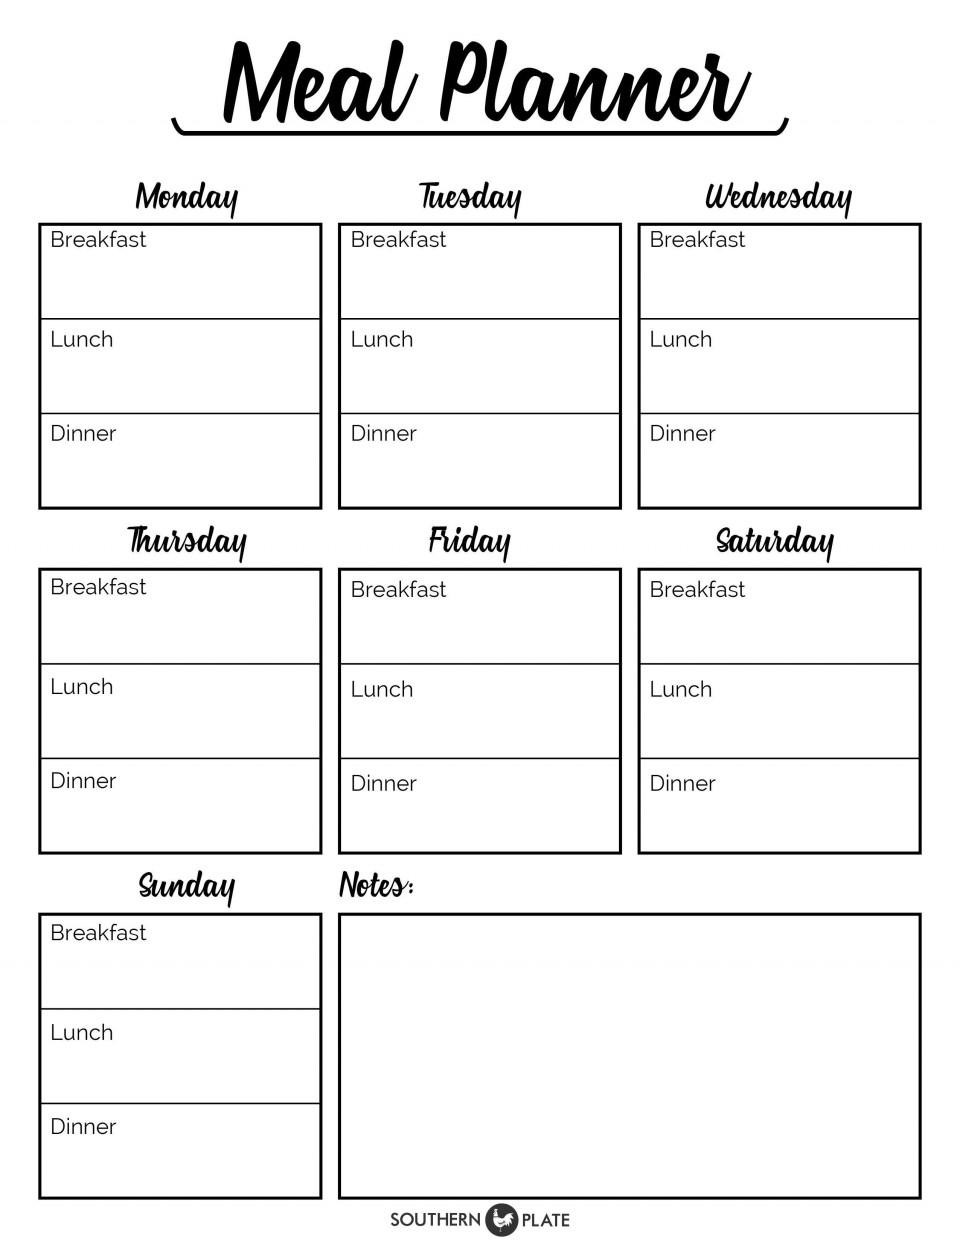 001 Incredible Meal Plan Printable Pdf Concept  Worksheet Downloadable Template Sheet960